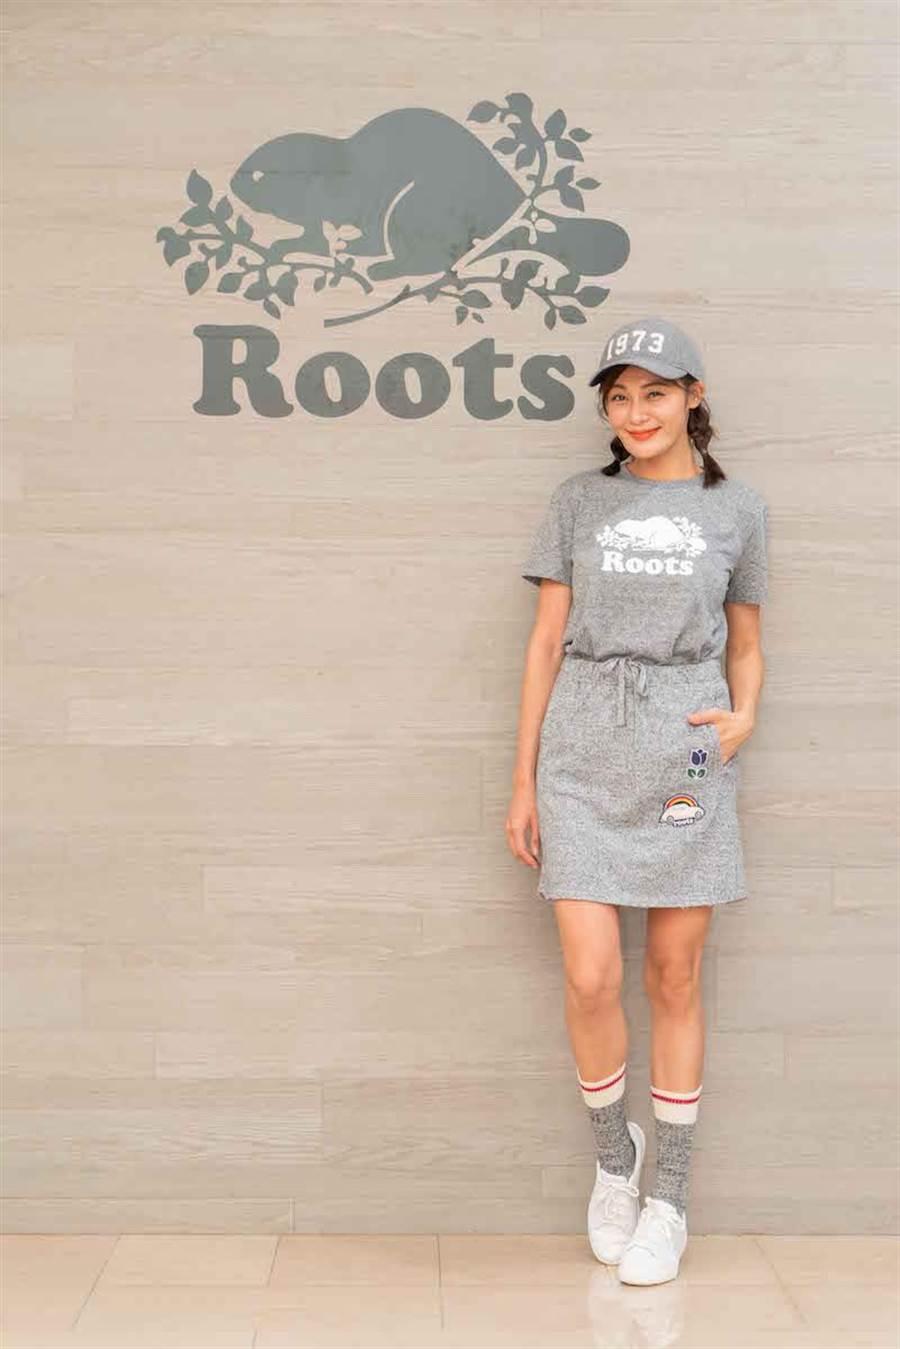 S&P基本款庫柏海狸短袖T恤1480元,立體貼布毛圈布短裙1880元,1973棒球帽1280元。(Roots提供)